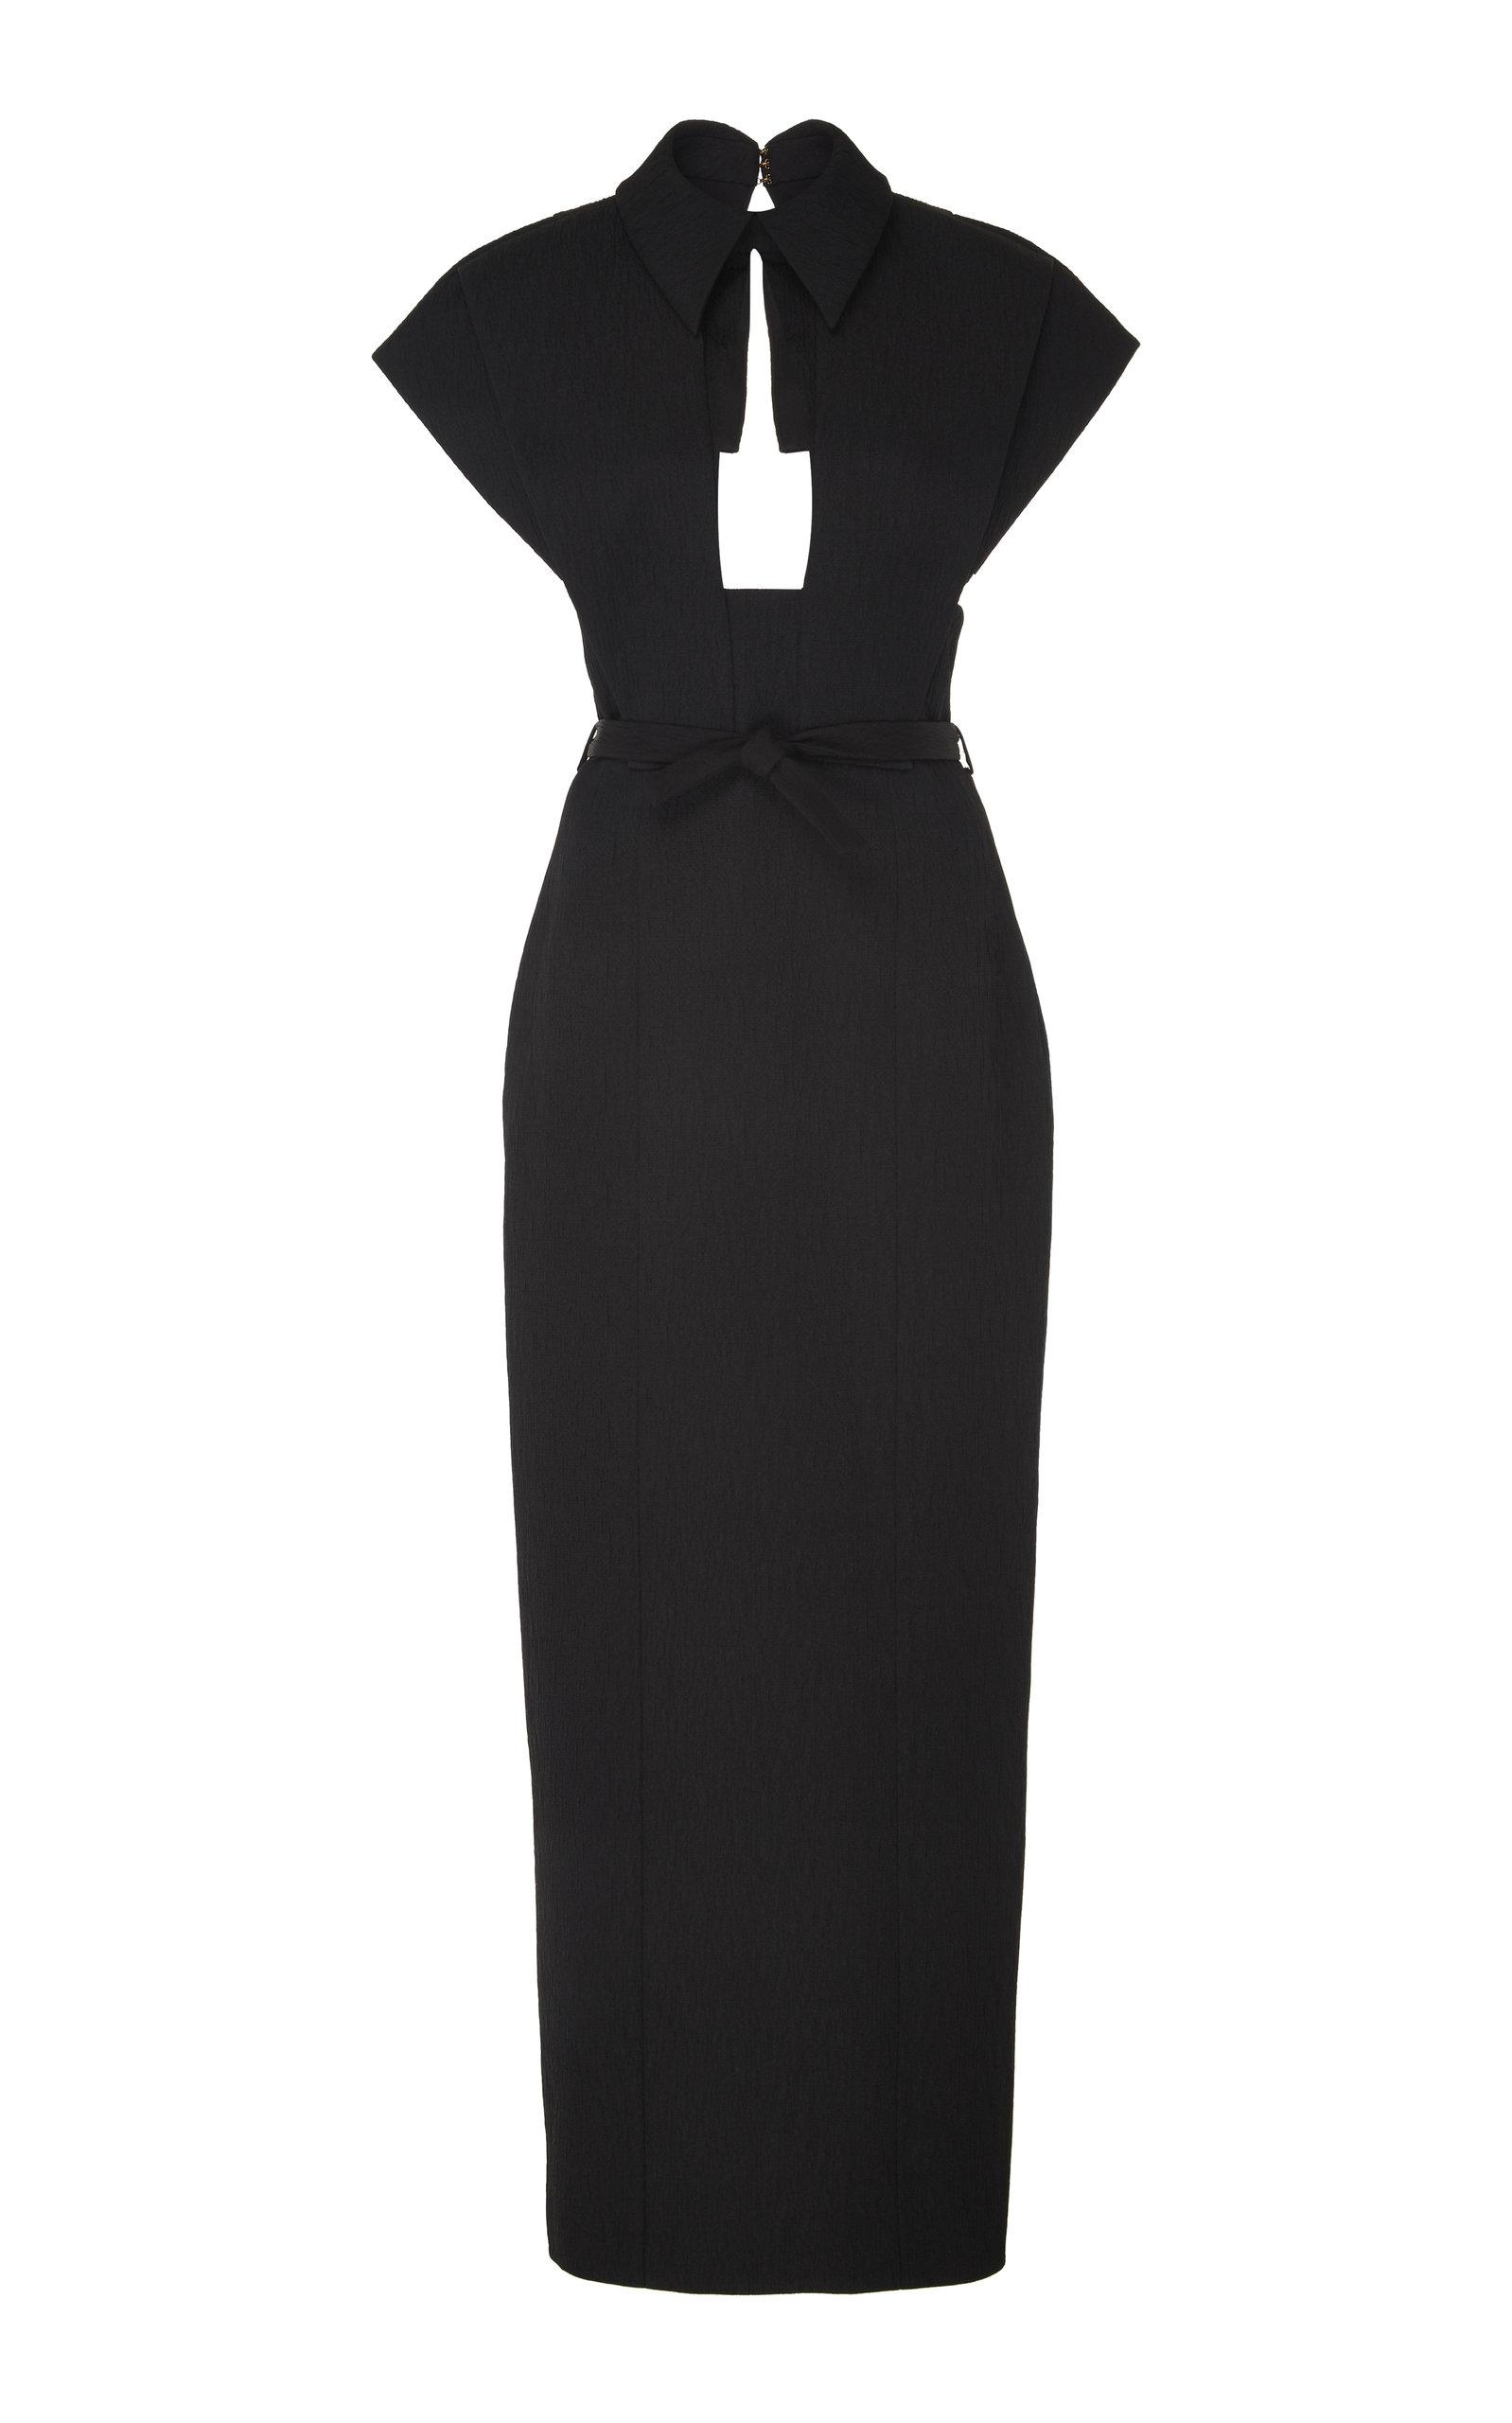 Buy Emilia Wickstead Cutout Cloqué Dress online, shop Emilia Wickstead at the best price